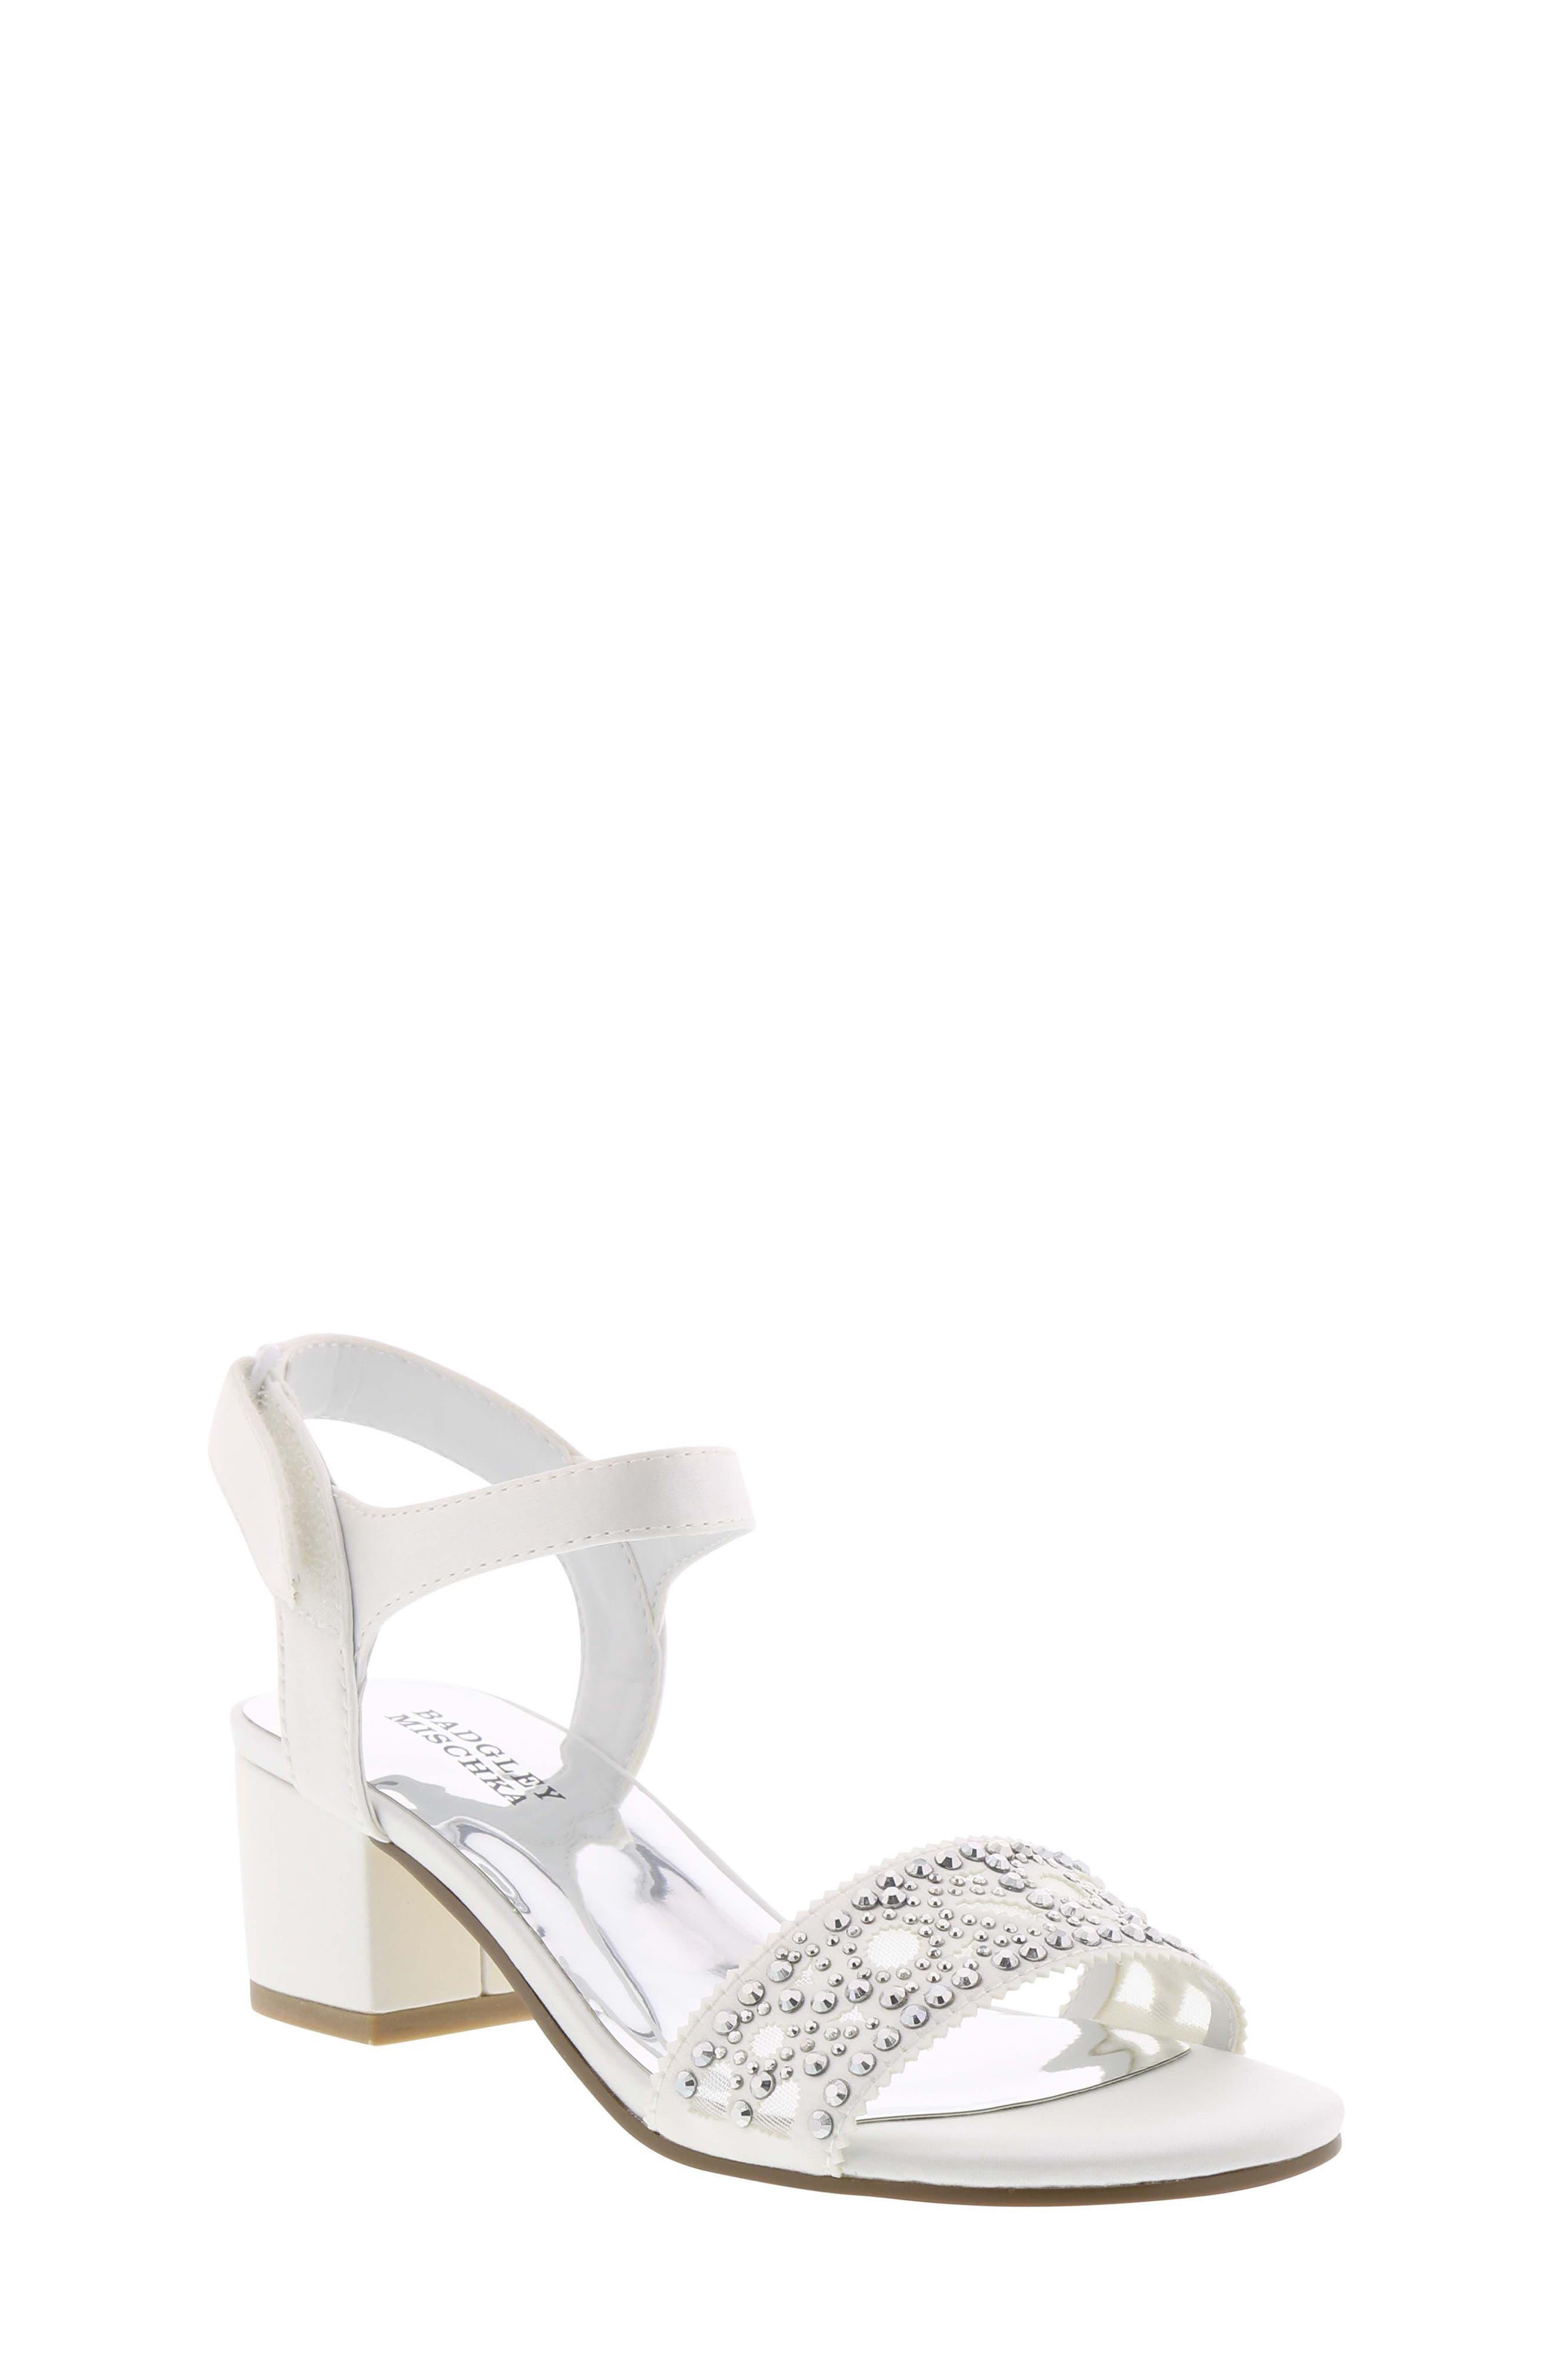 Ascot Gems Sandal,                             Main thumbnail 1, color,                             White